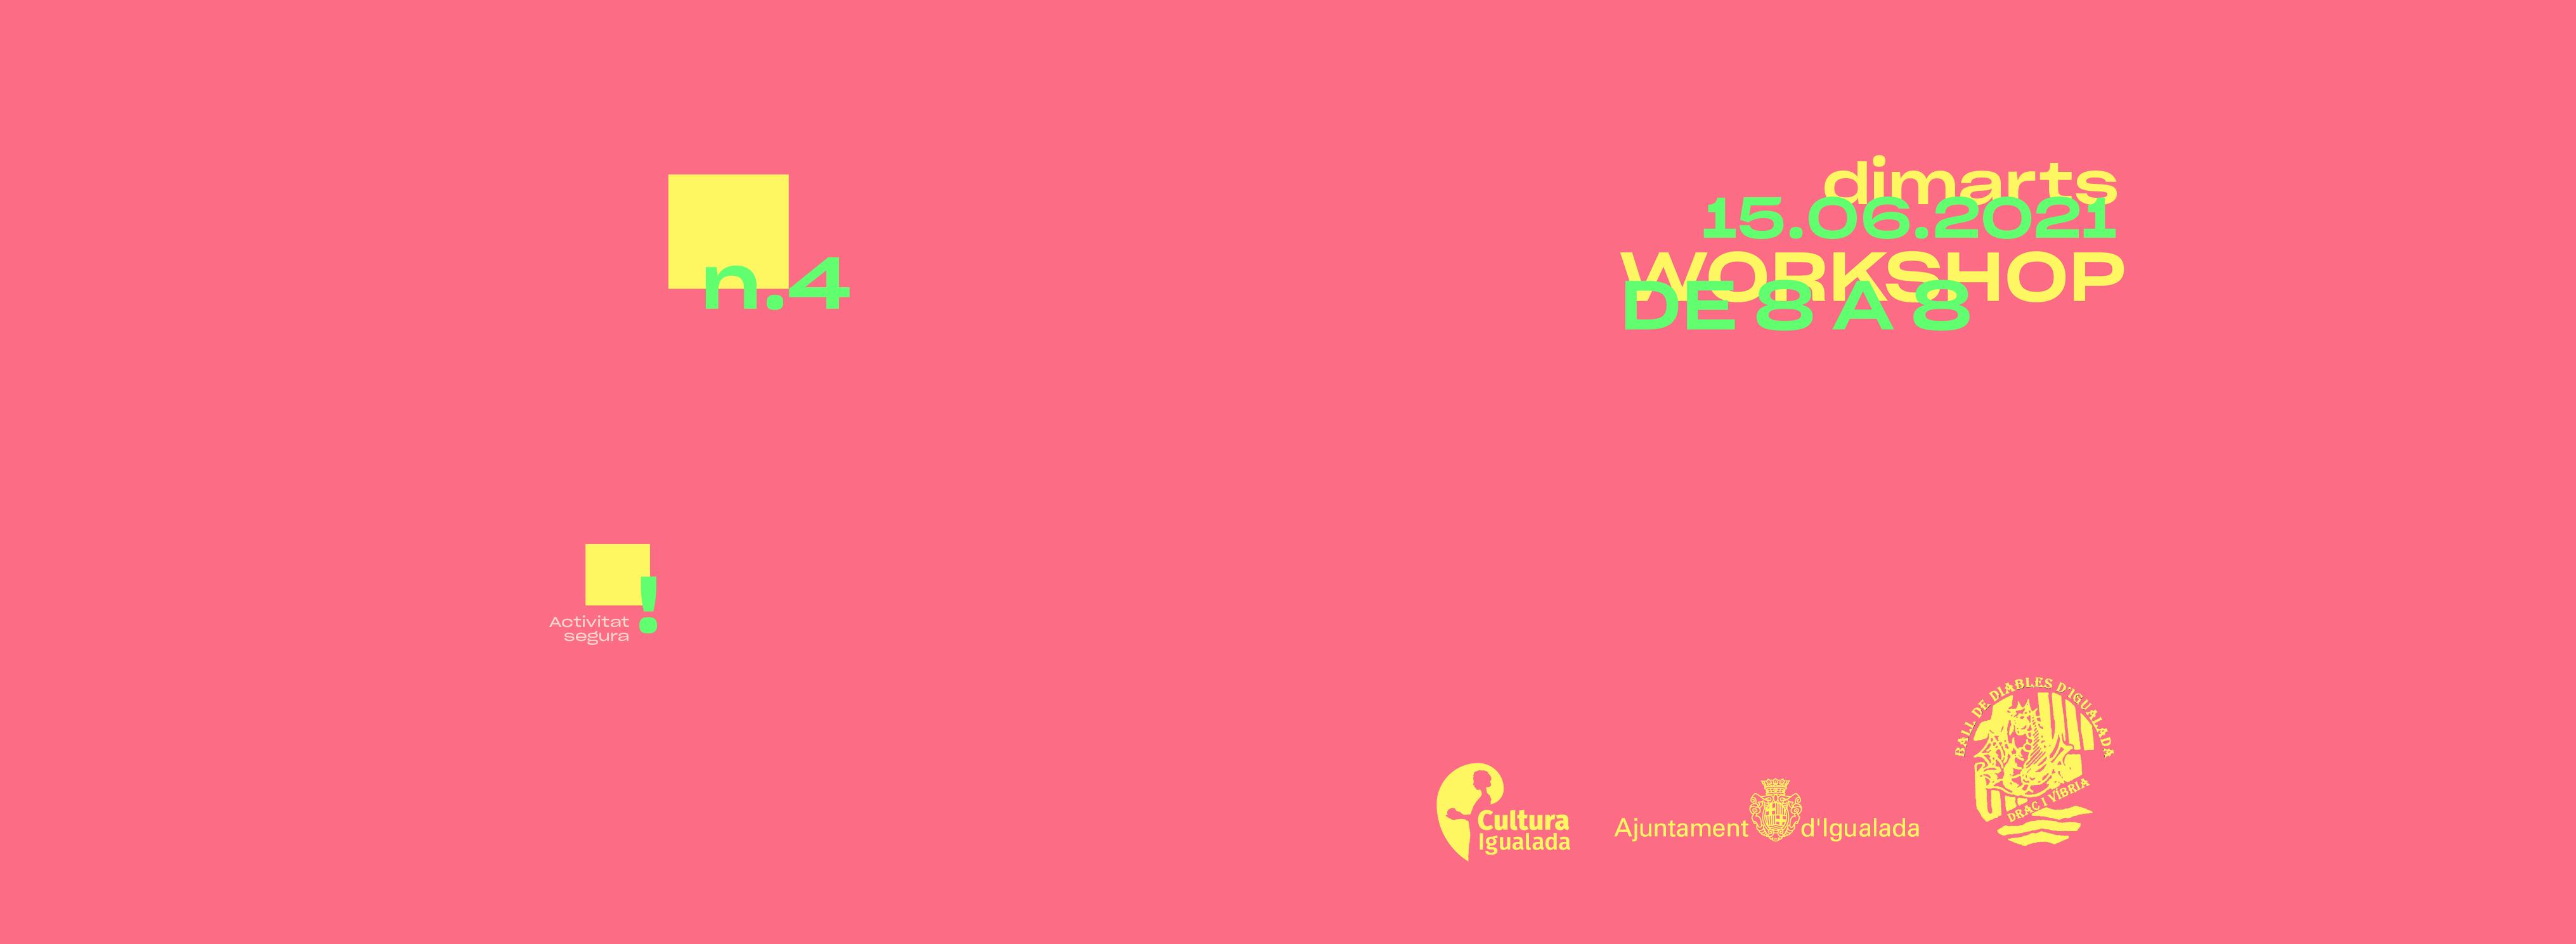 Wokshop de 8 a 8 amb OuYeah! Studio